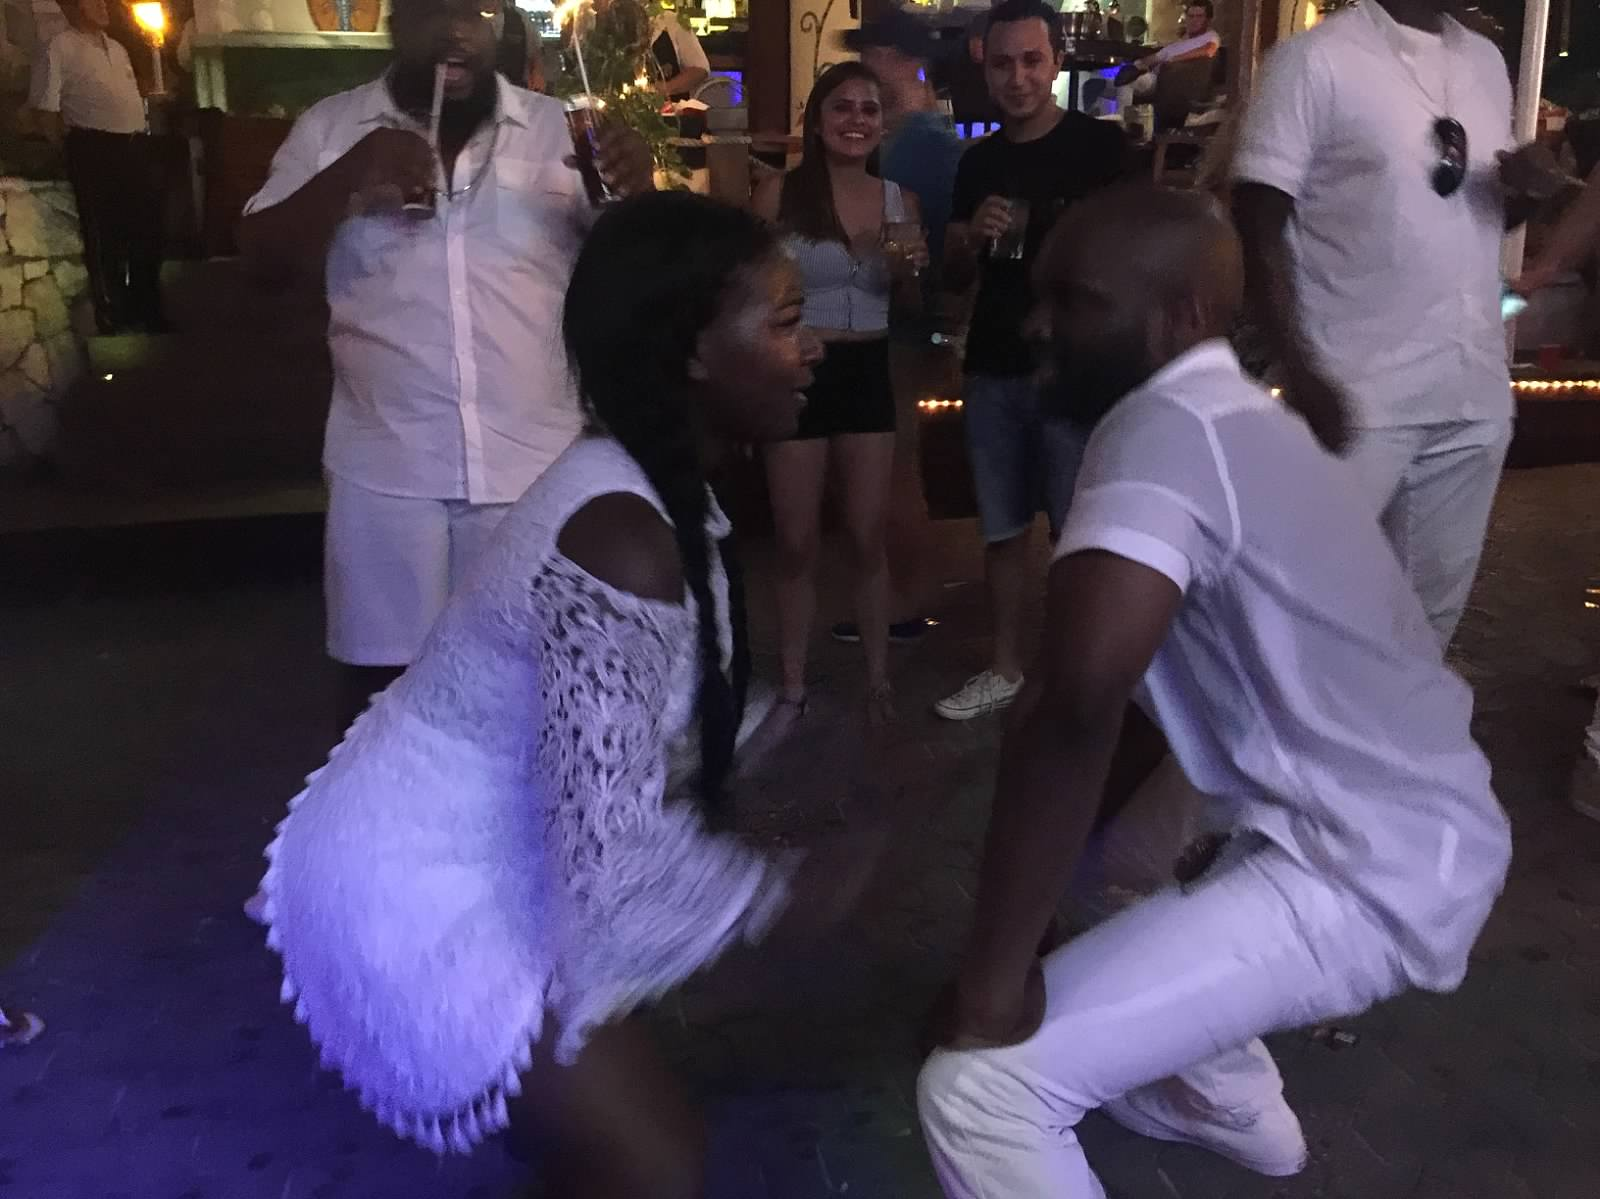 Black Destination Bride - BlackDesti Wedding Countdown Journal - Bridefriends Podcast - 1 Playa del Carmen Mexico - Carboncitos Dancing.jpeg